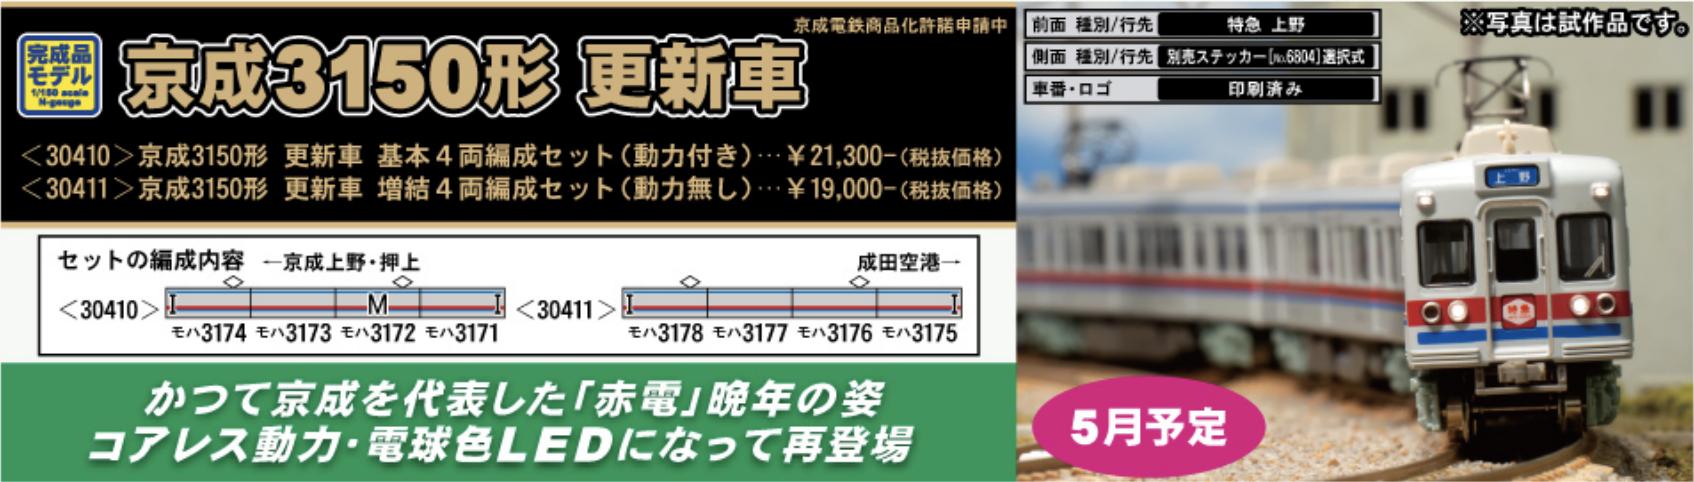 GREENMAX グリーンマックス 30410 30411 京成3150形 更新車